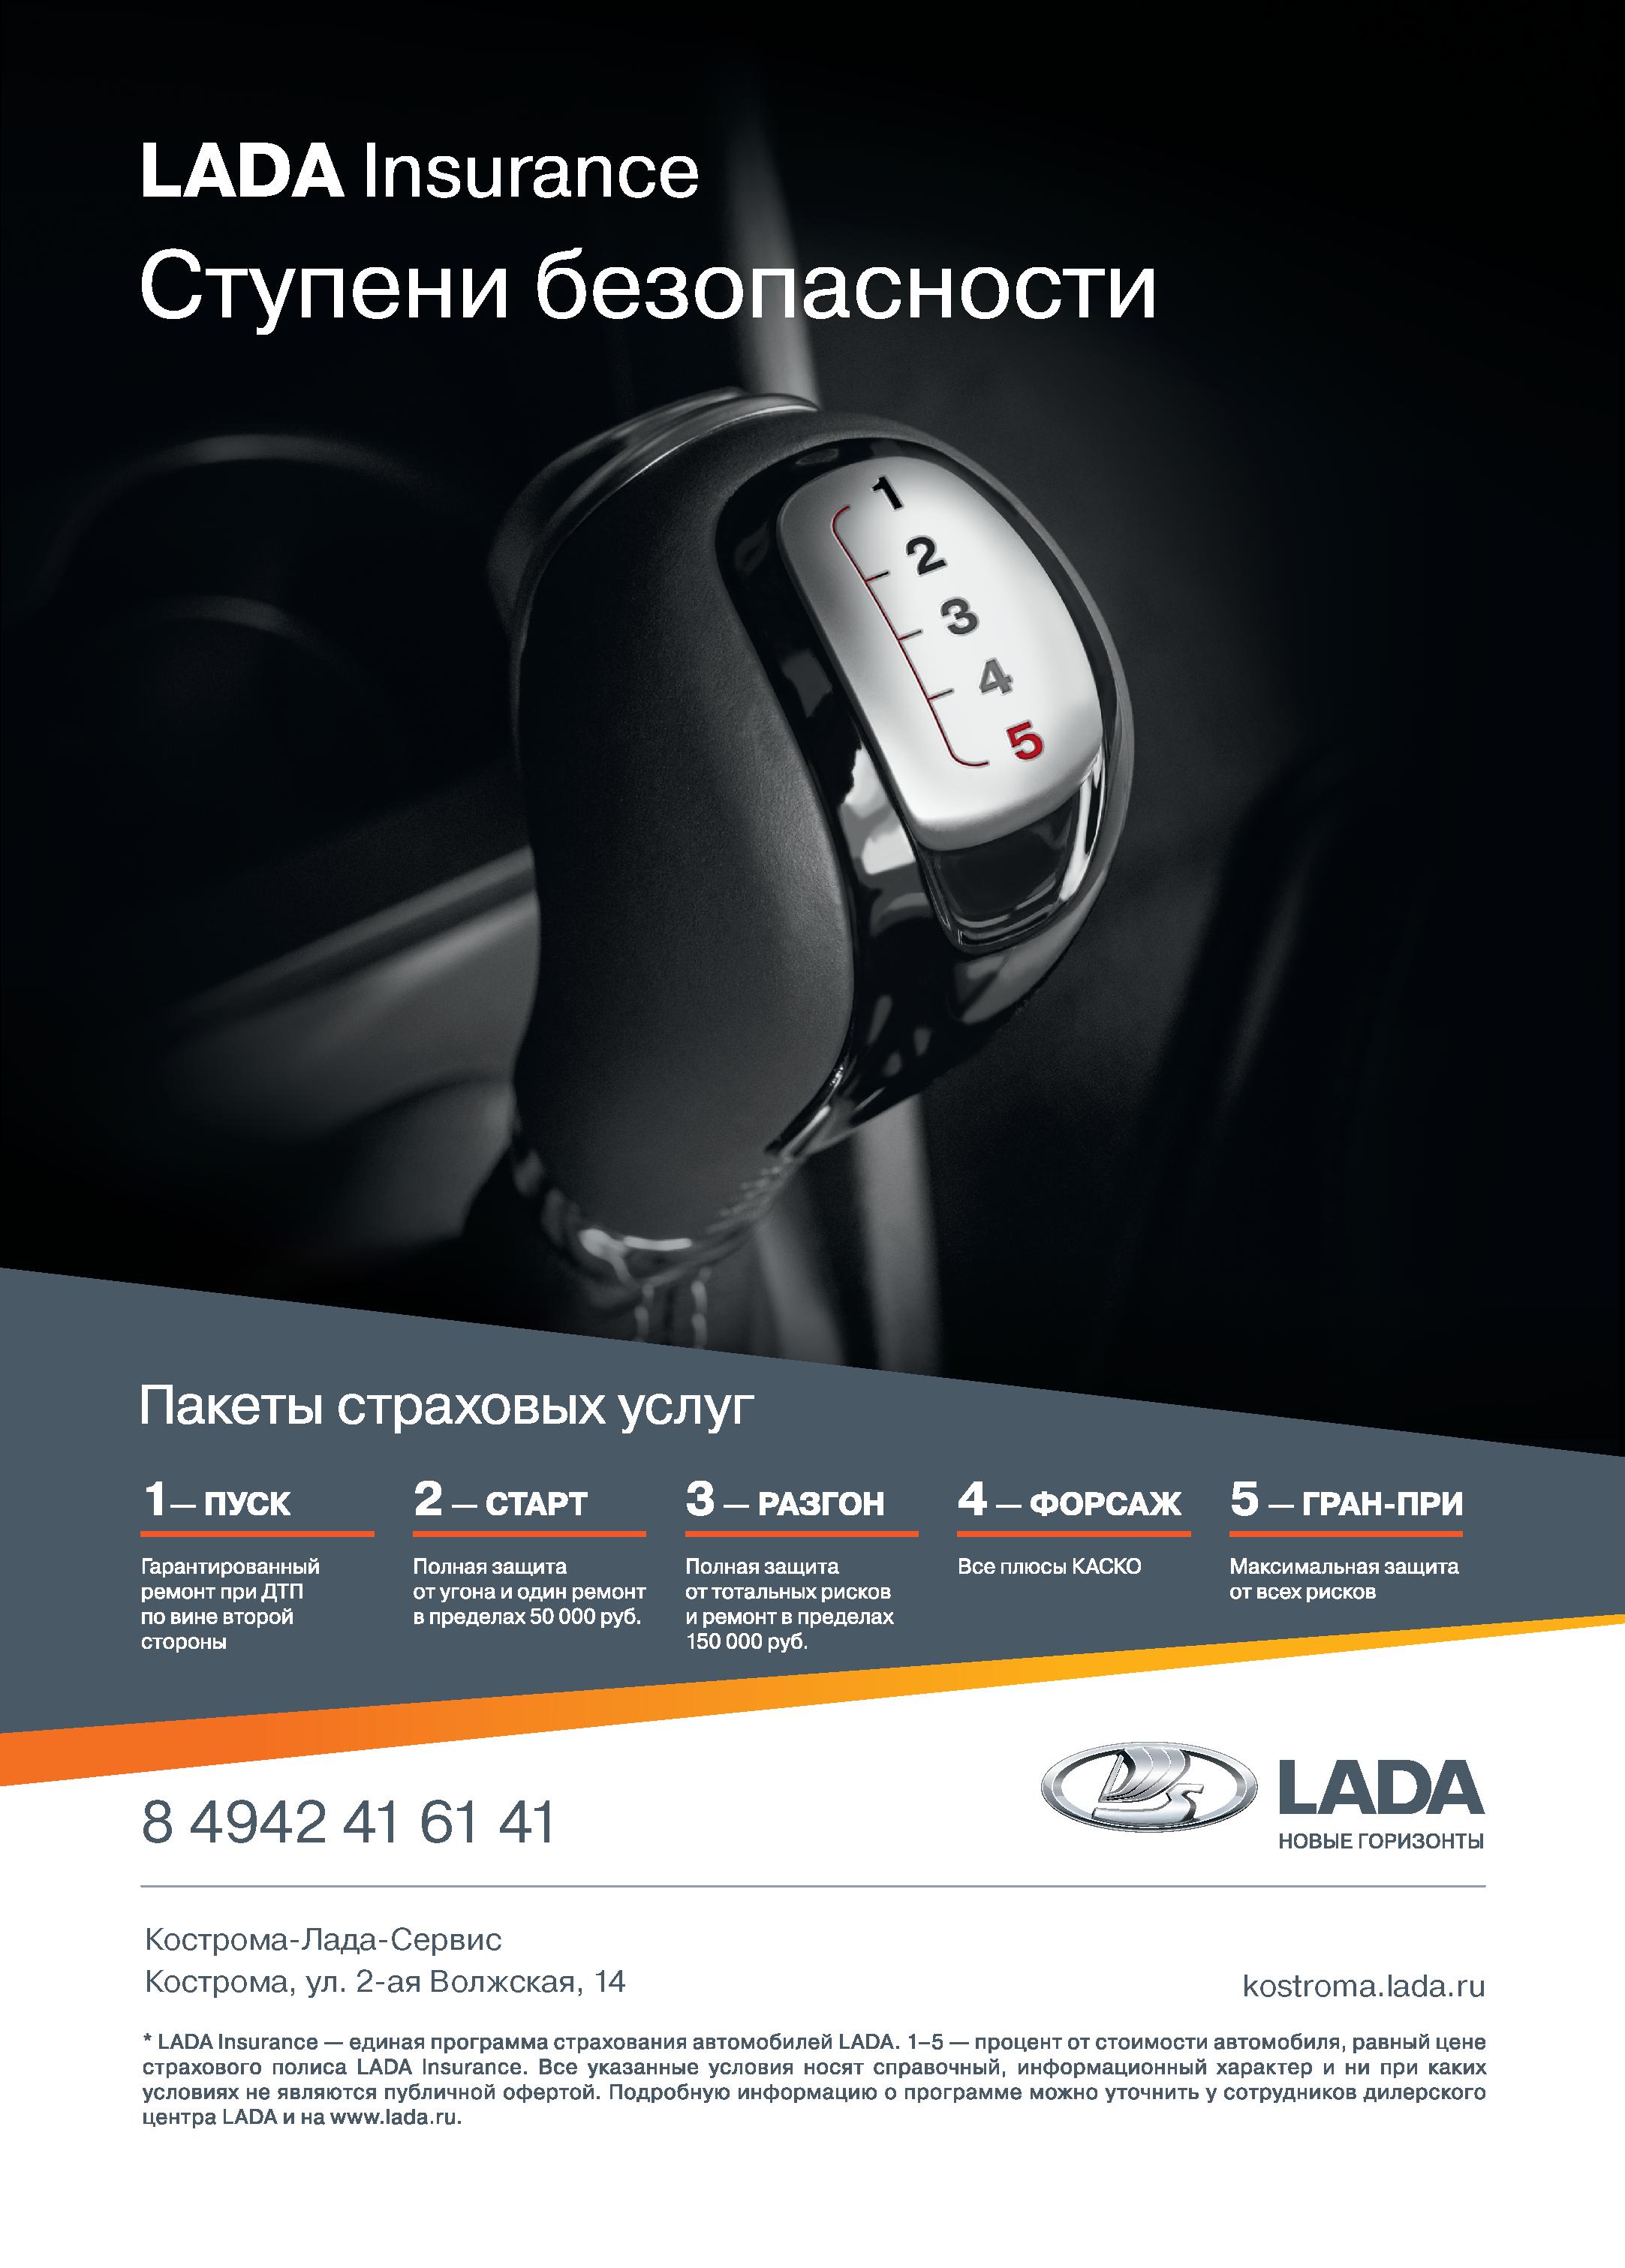 LADA Insurance. Ступени безопасности